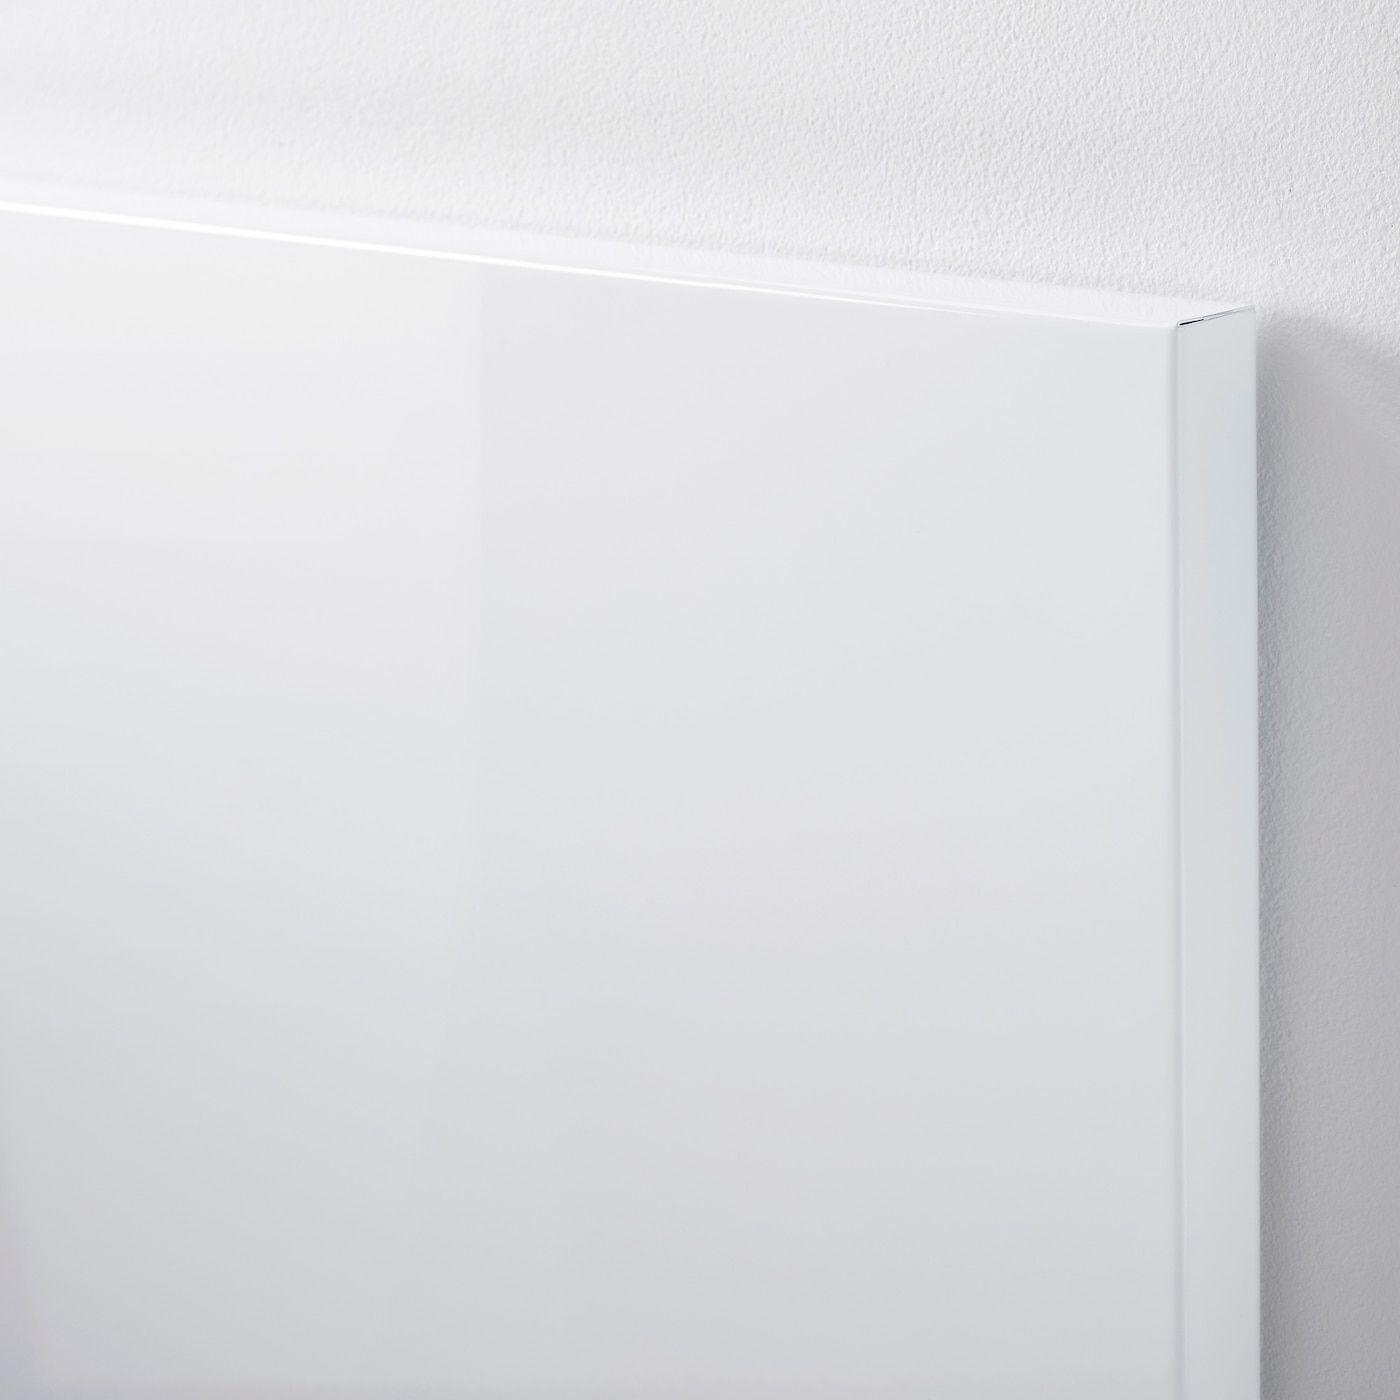 Svensas Tableau Memo Blanc Ikea Tableau Memo Tableau Blanc Magnetique Ikea